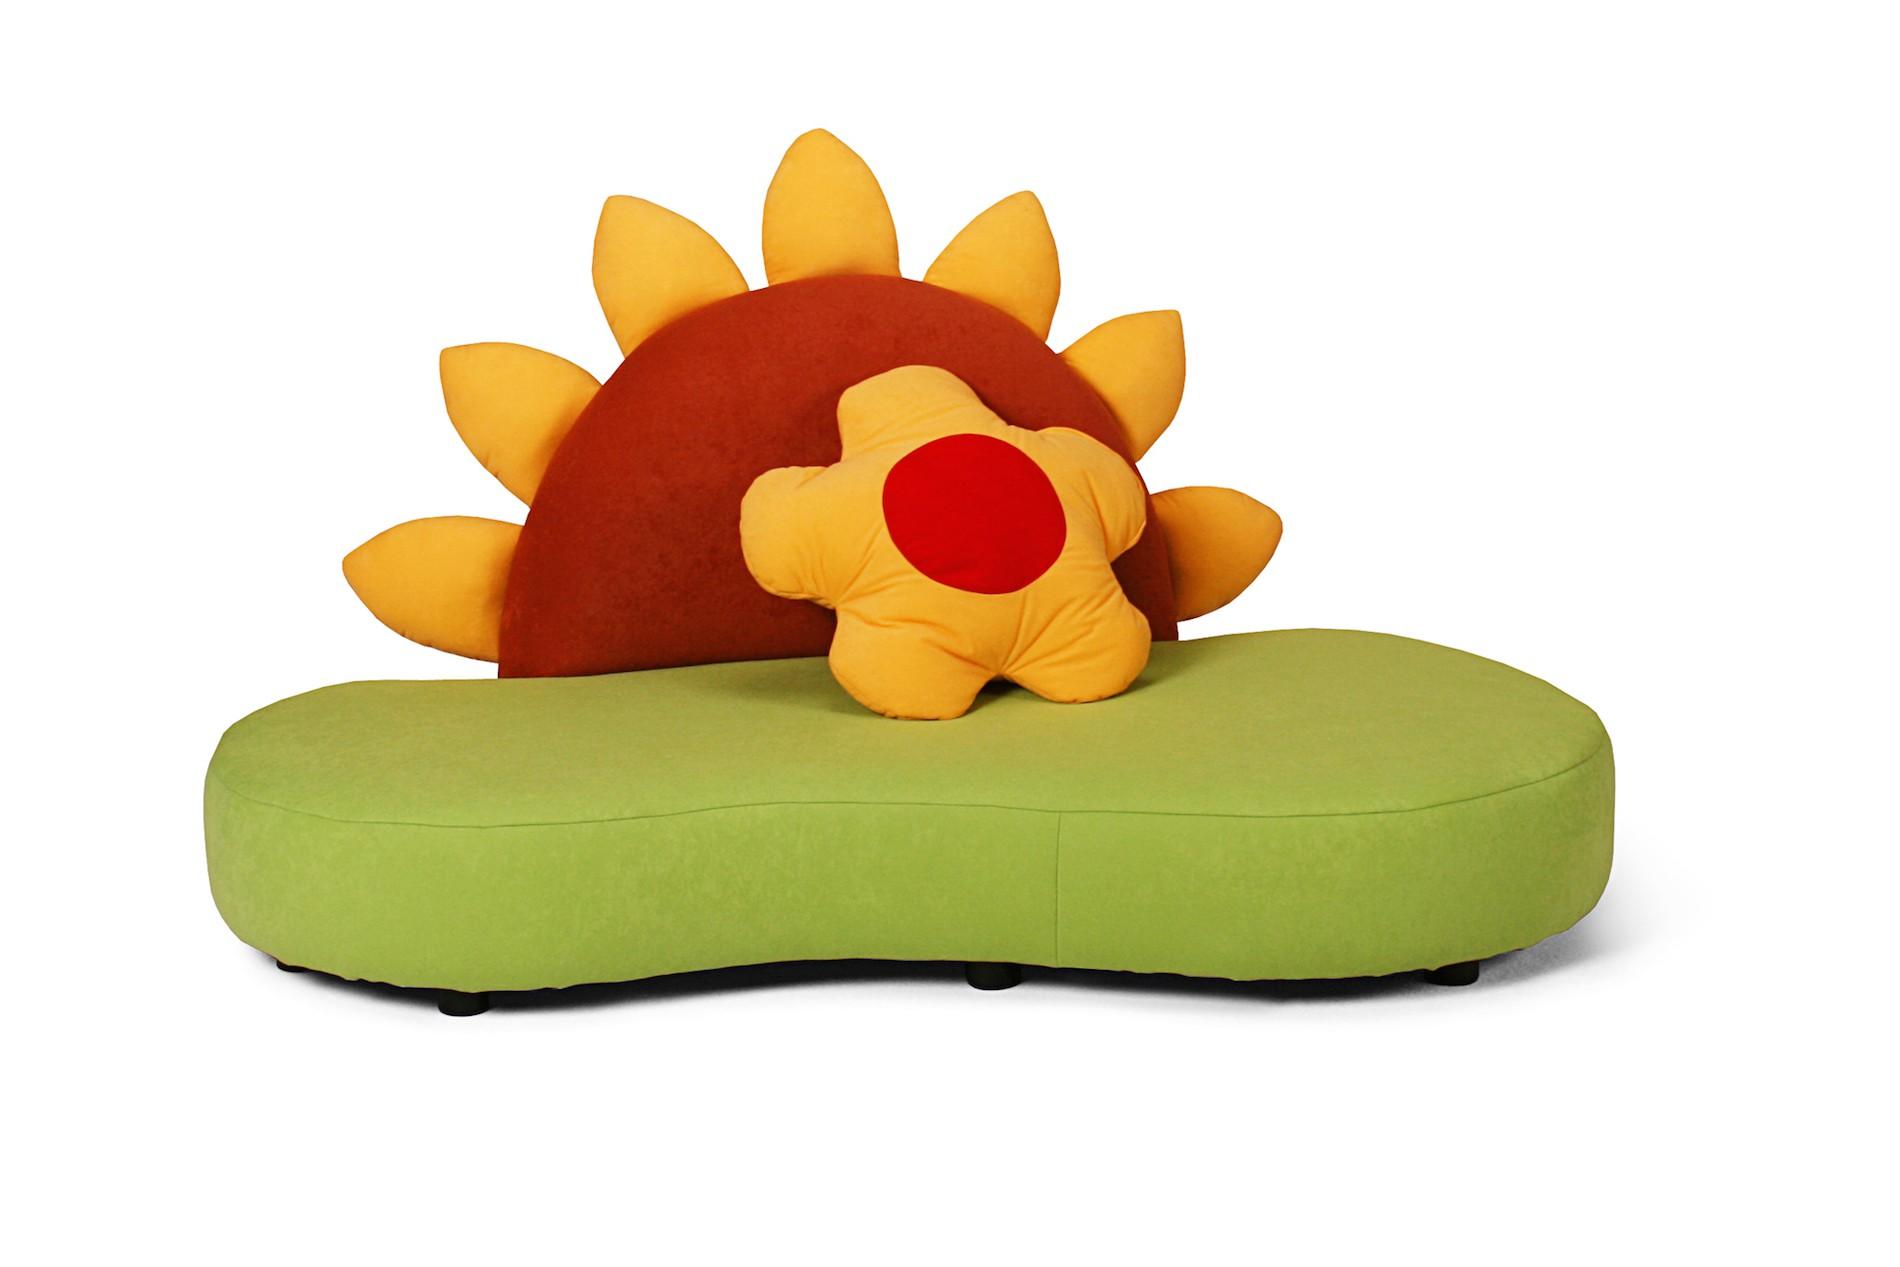 Kindersofa mit Sonnenblume KINIC Kindersofas